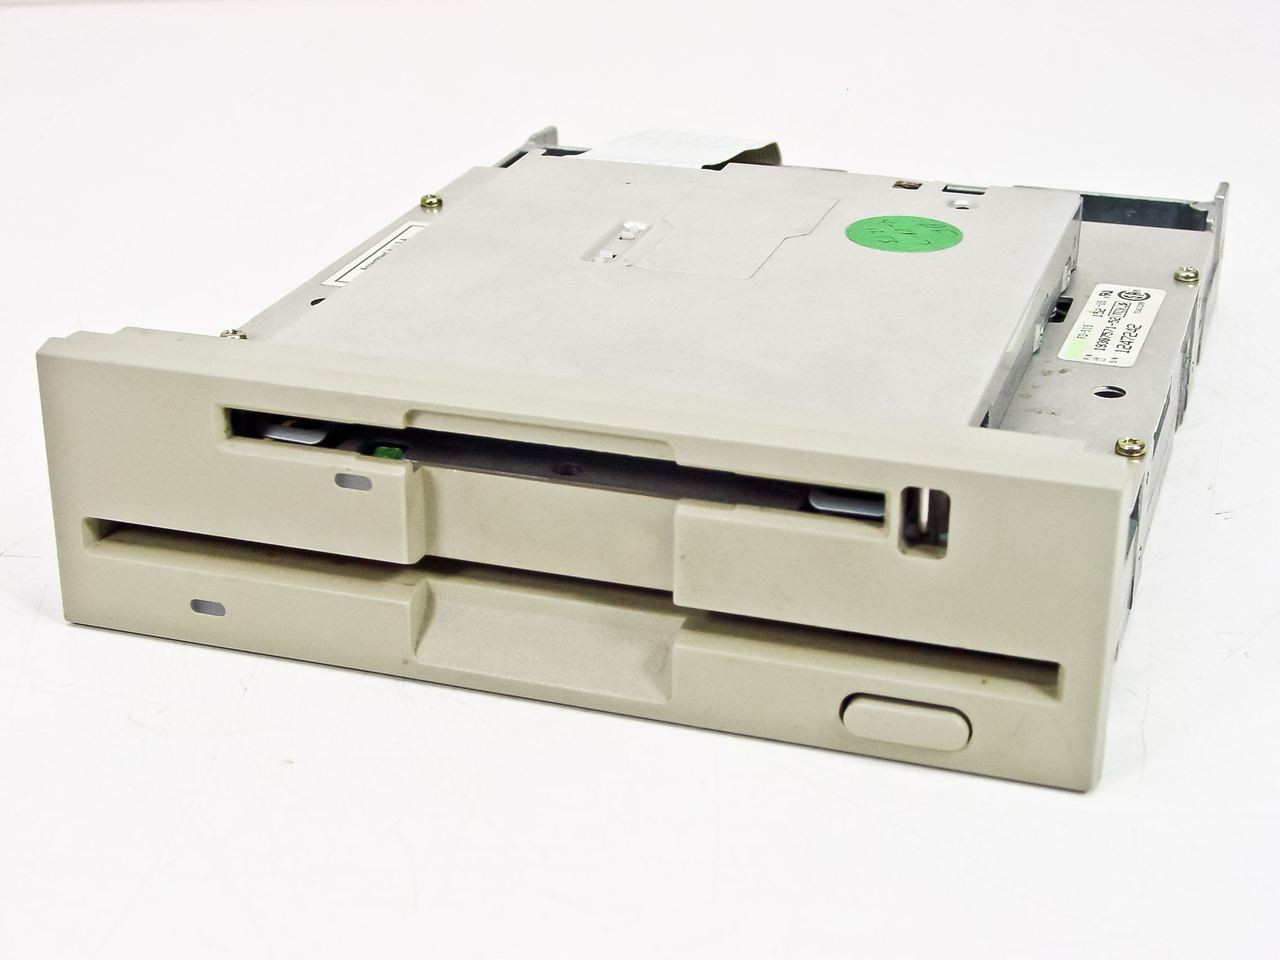 Teac FD-505 1.2/1.44 MB Combo Dual Floppy Drive ...